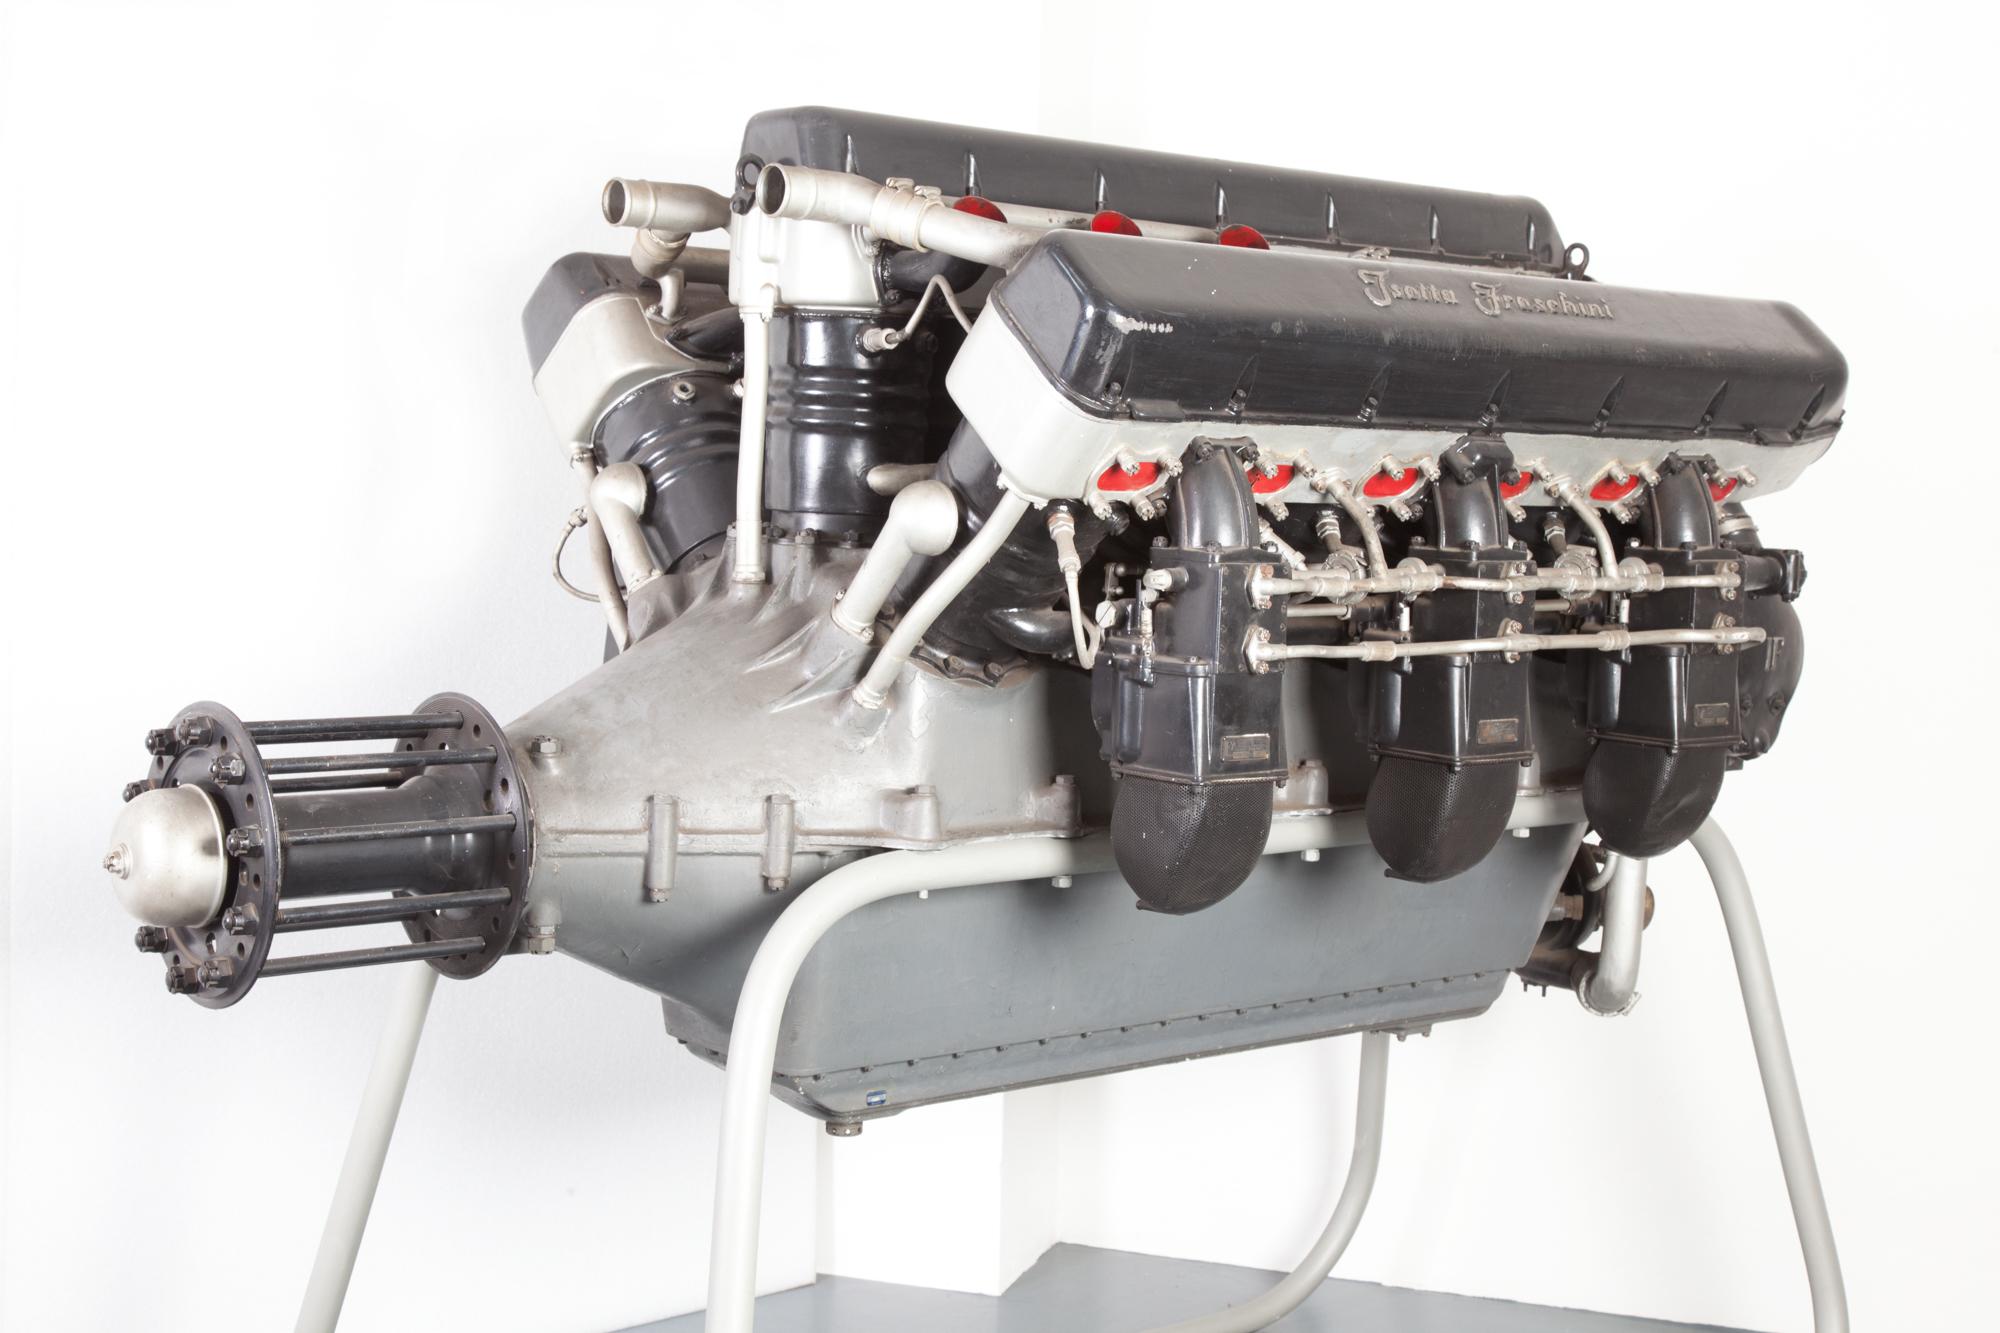 [SCHEMATICS_48EU]  W18 engine - Wikipedia | Bugatti W18 Engine Diagram |  | Wikipedia